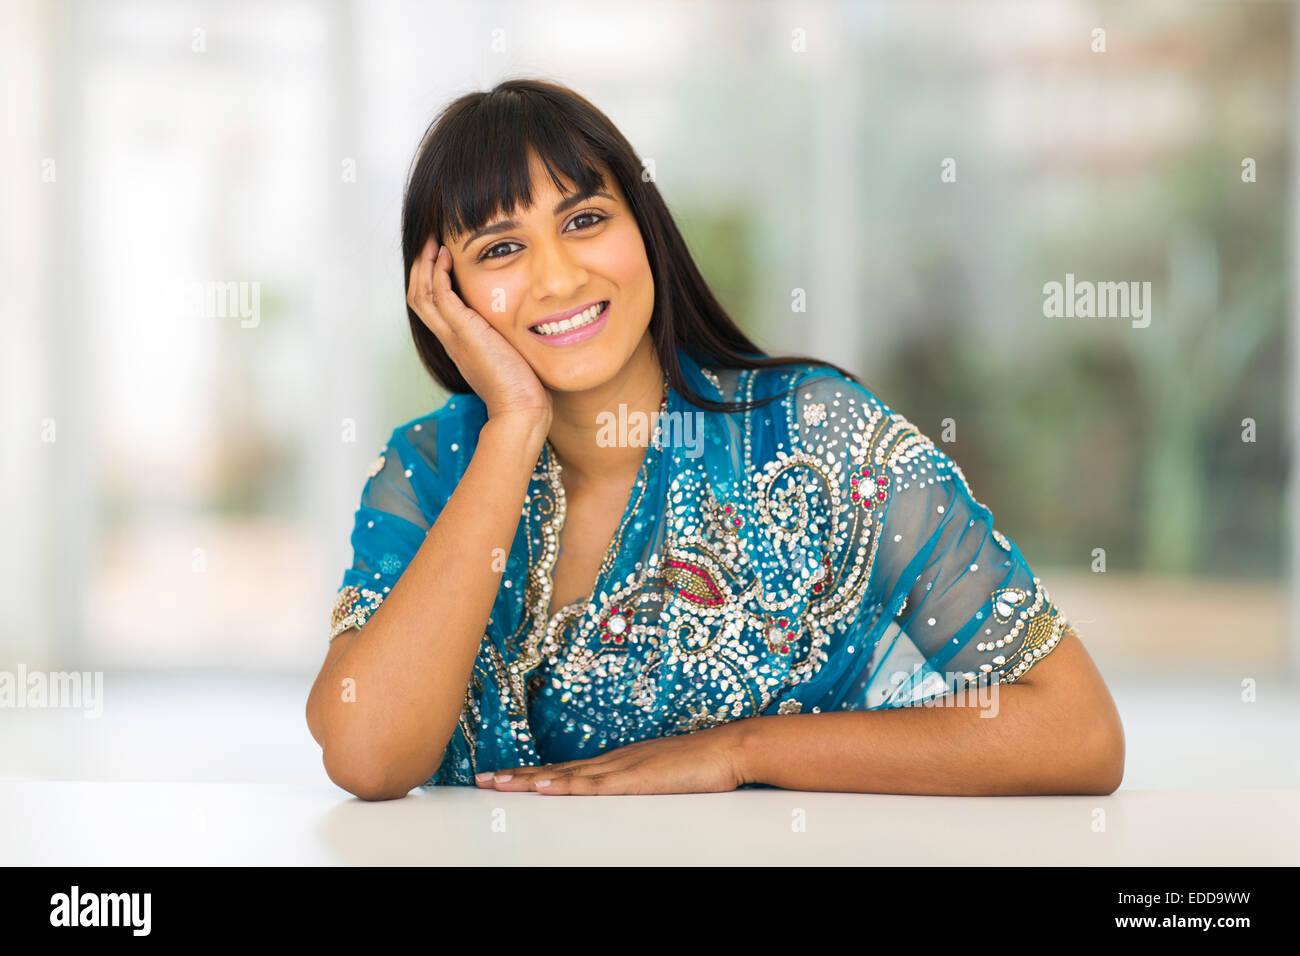 Bella donna indiana seduti a casa Immagini Stock